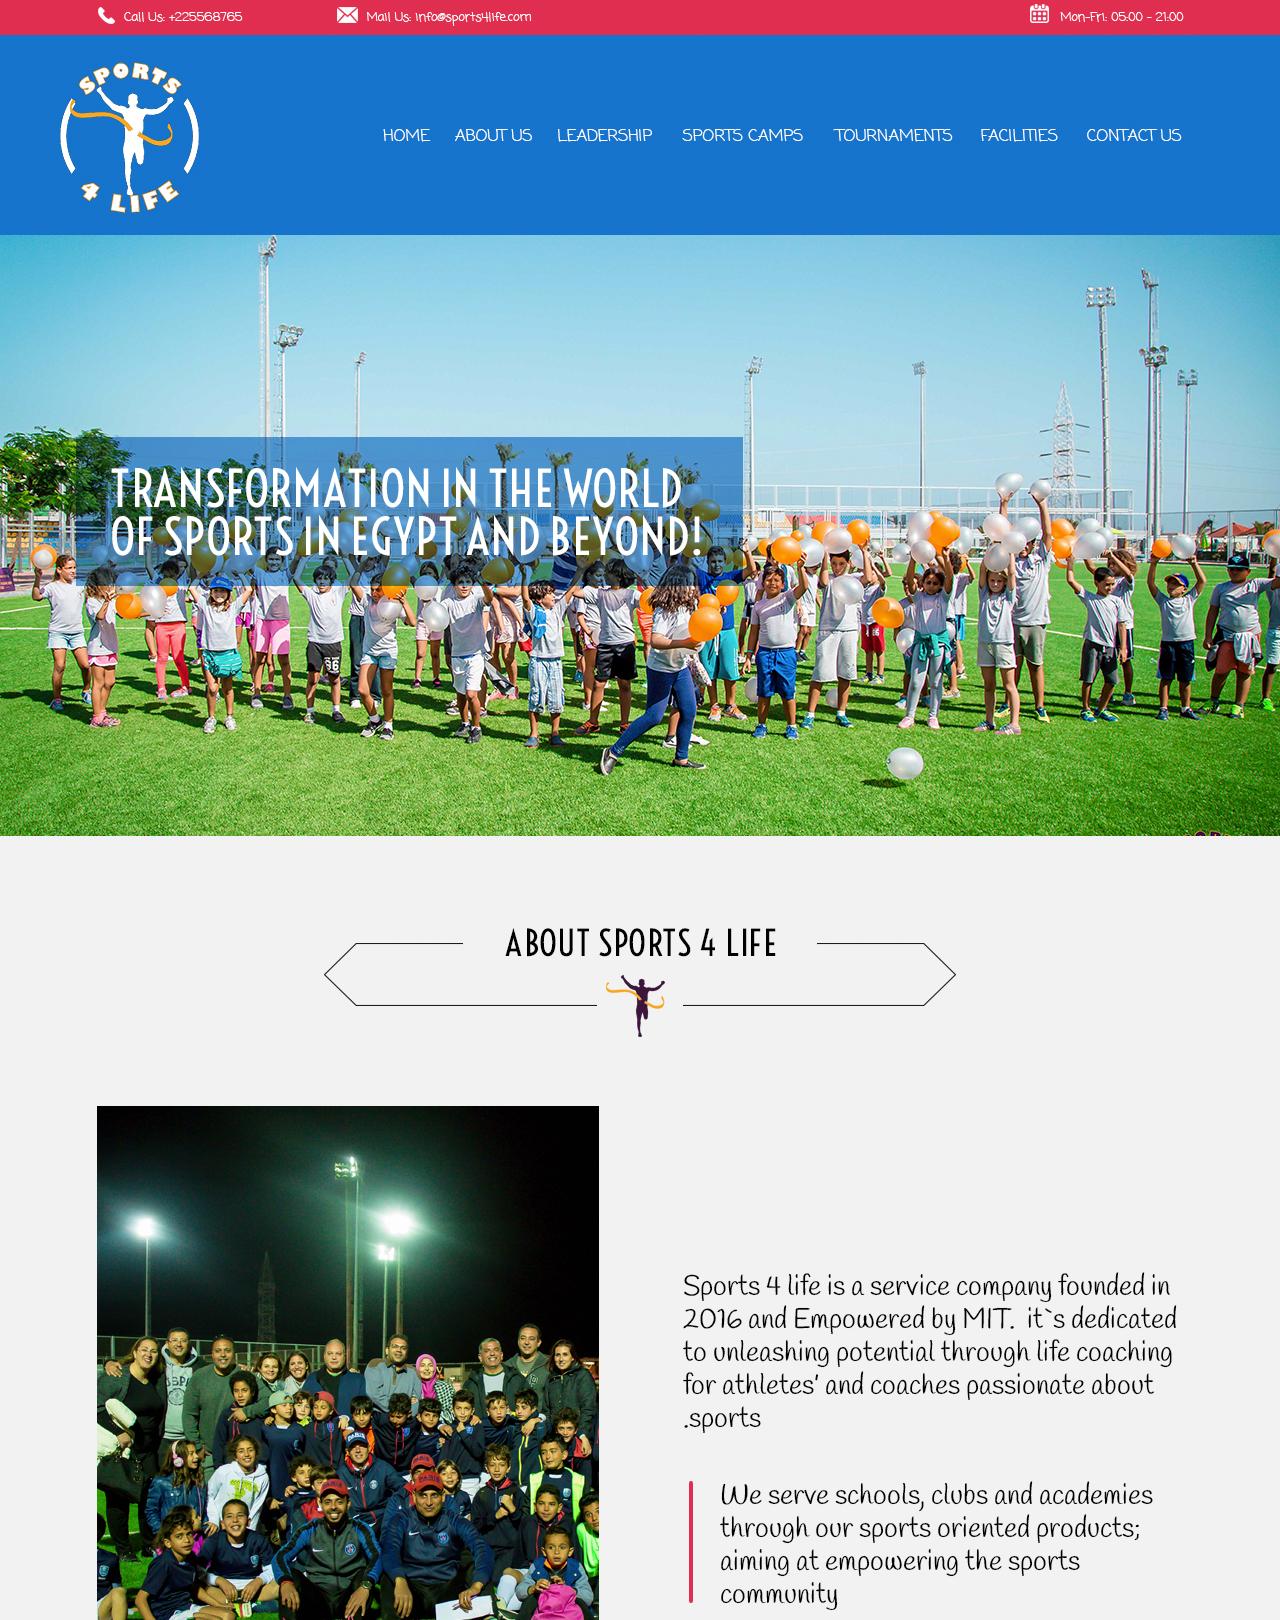 sports-4-life